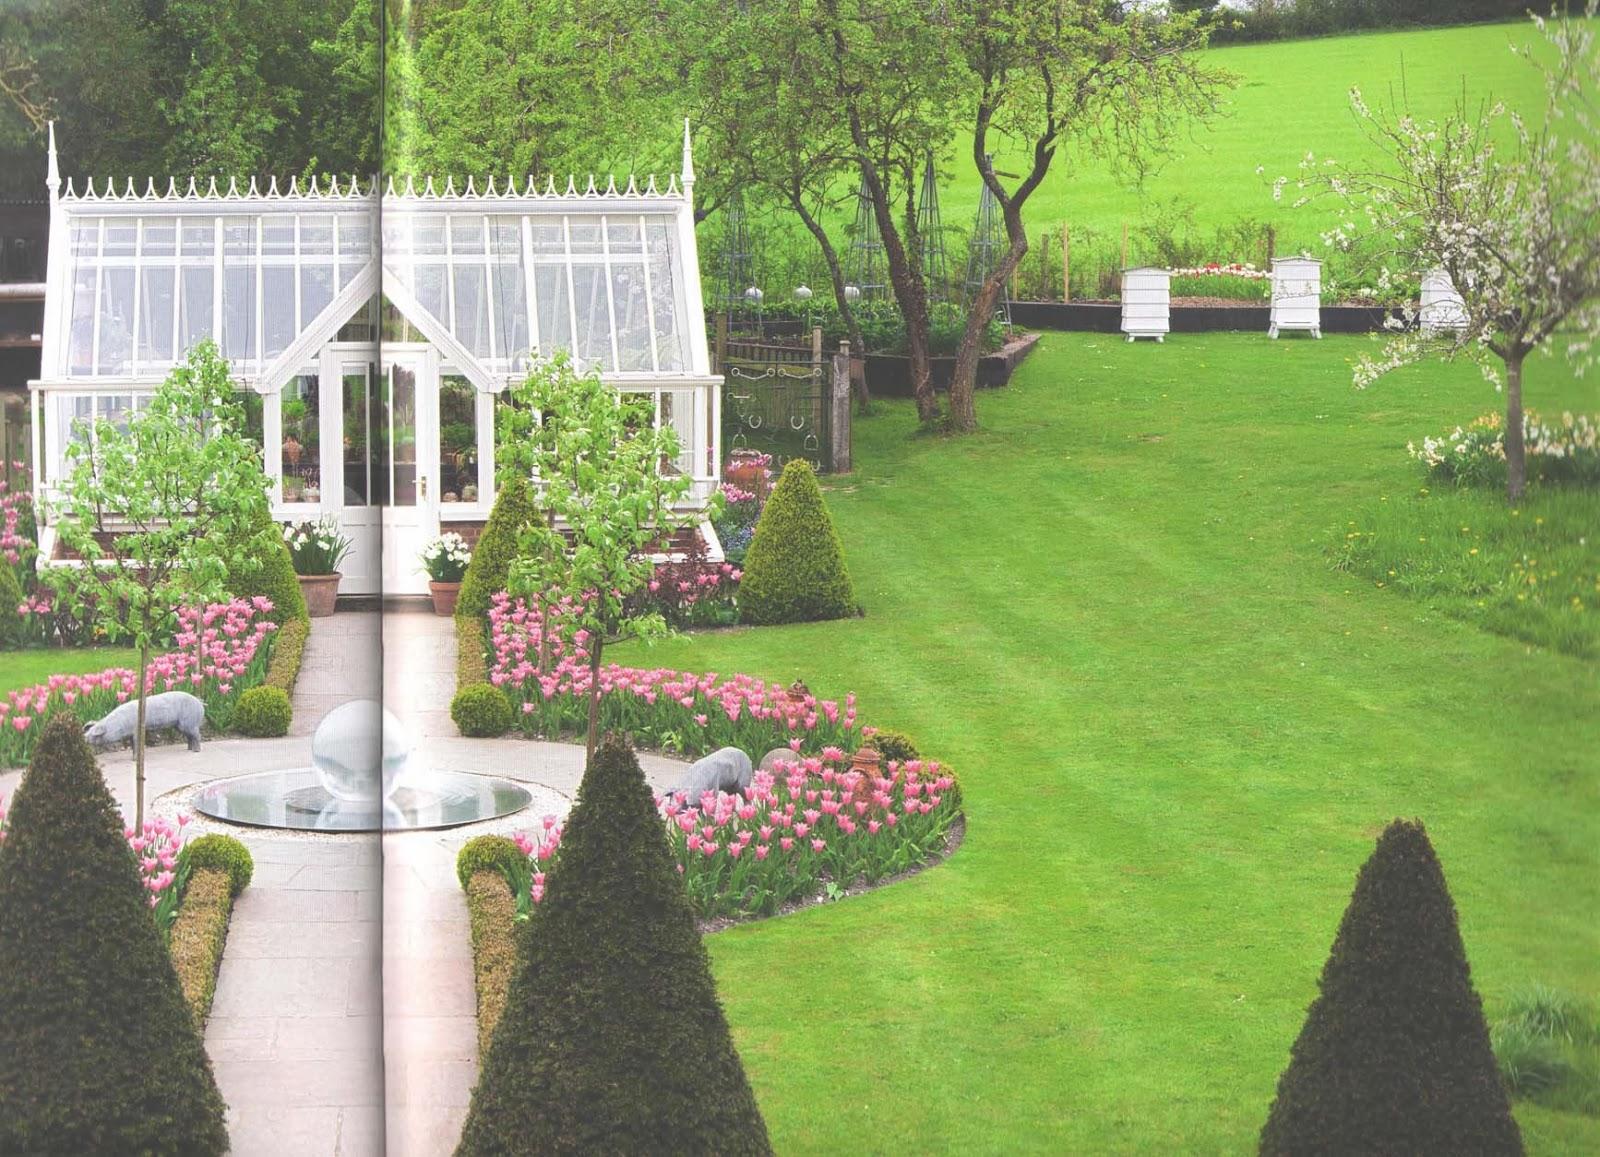 garden fancy  book review   u0026quot my secret garden u0026quot  by alan titchmarsh